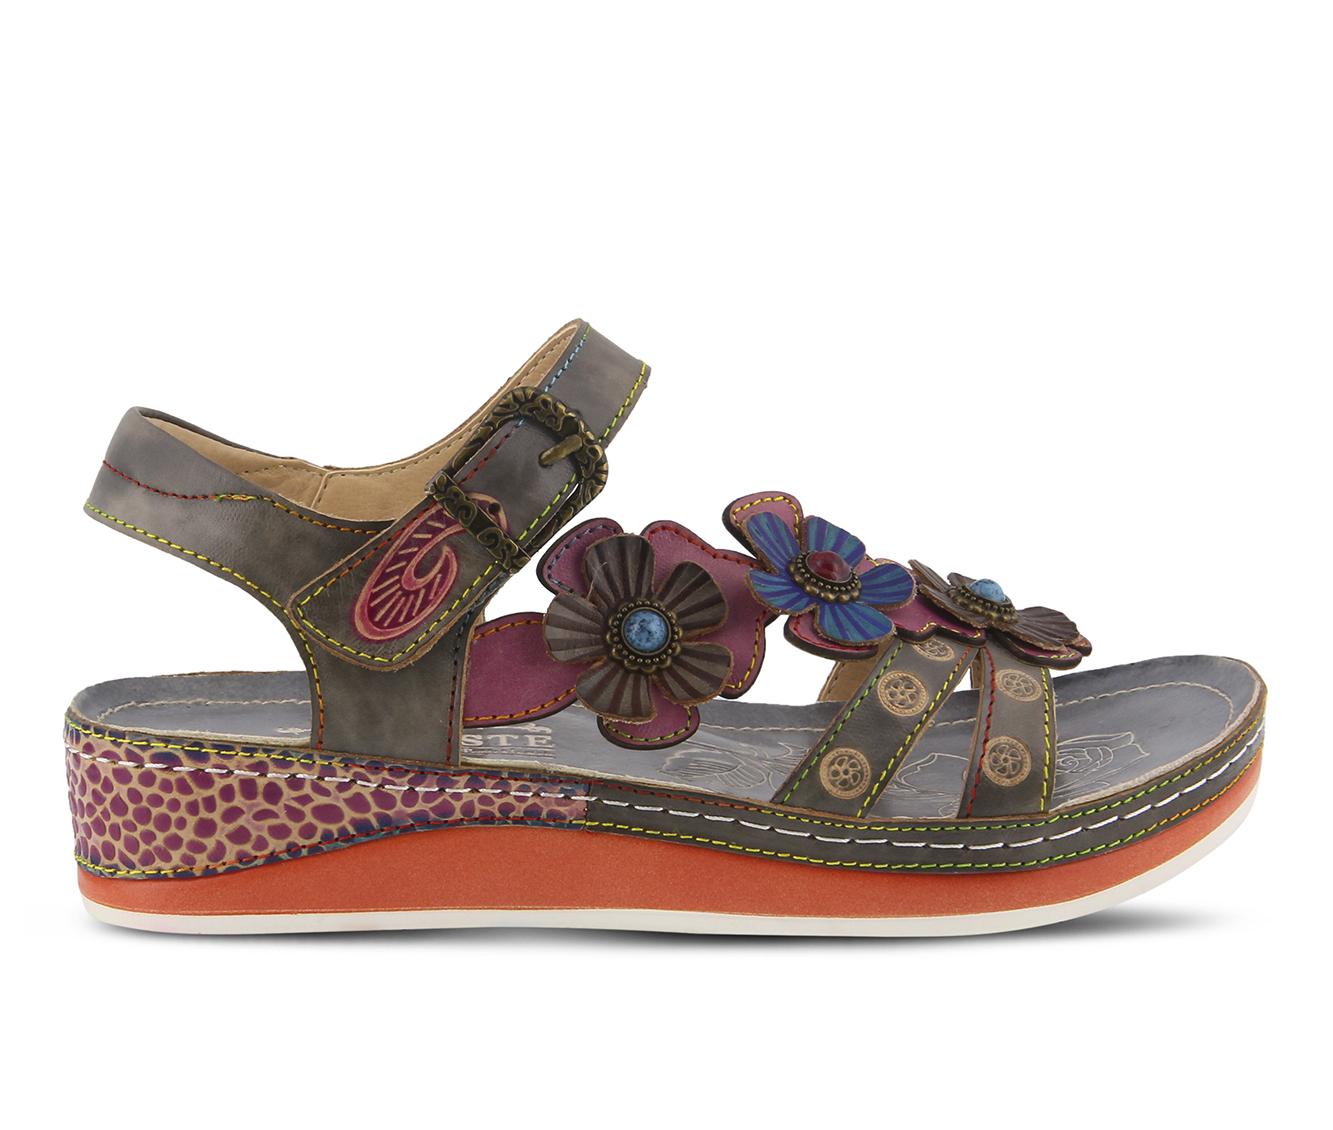 L'Artiste Goodie Women's Sandal (Gray Leather)